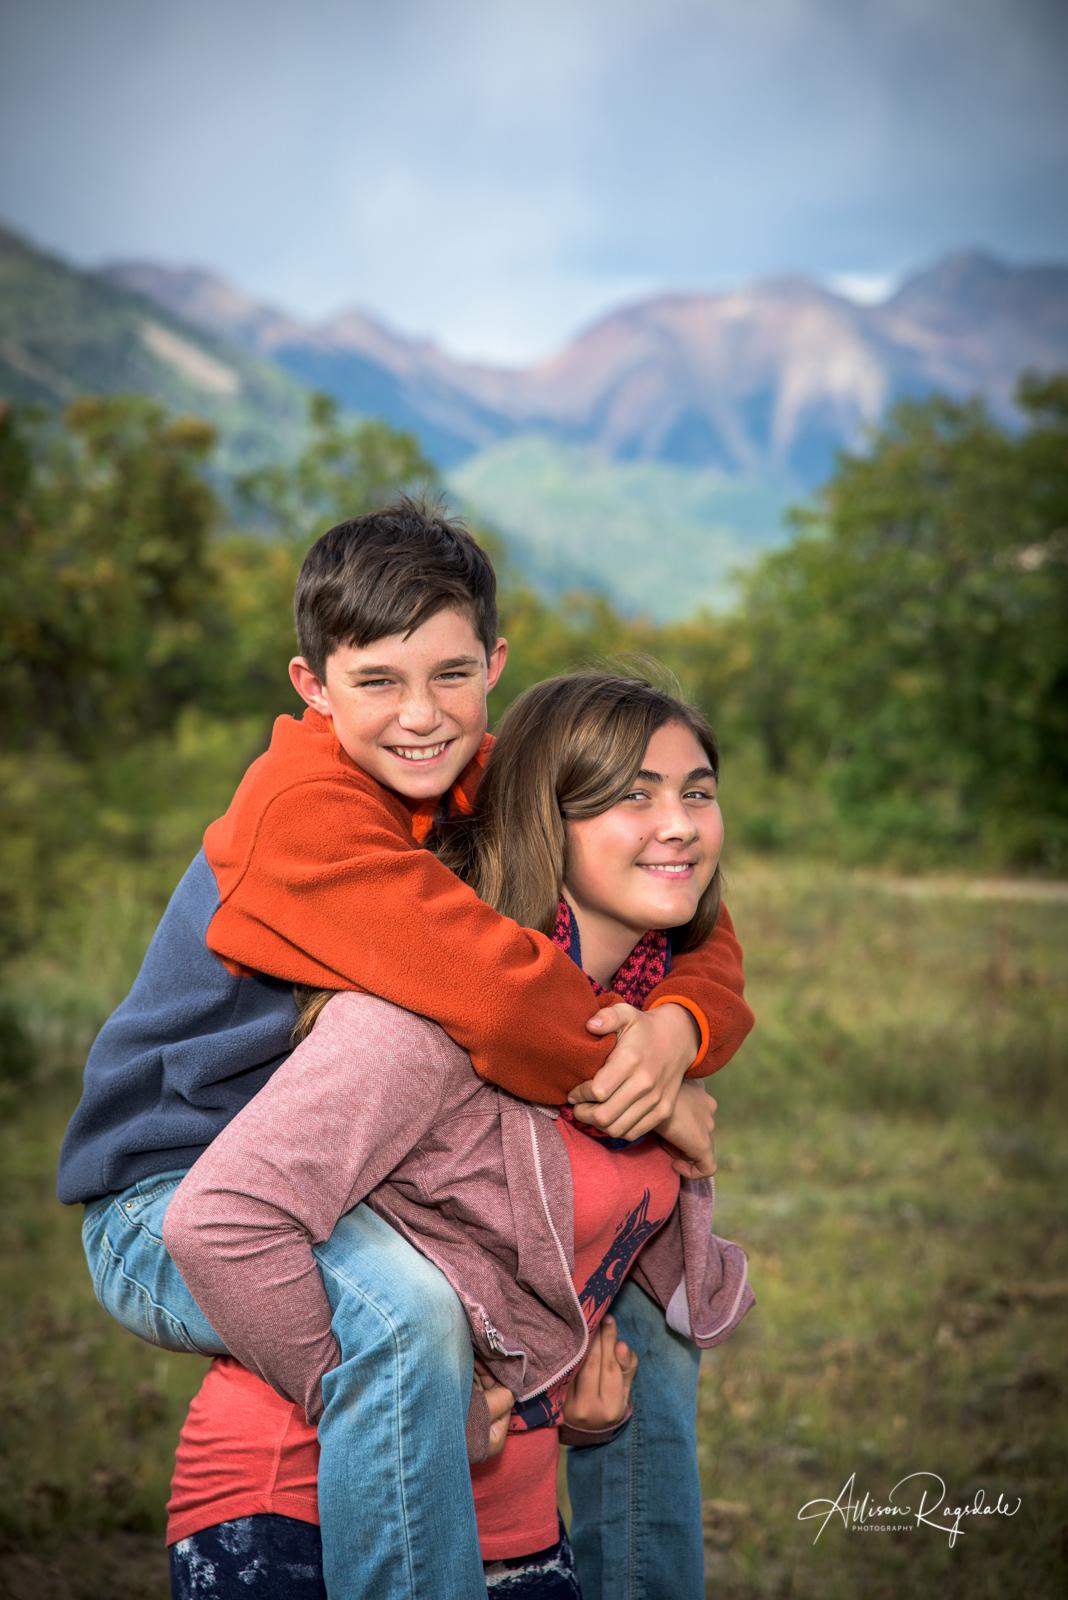 Allison Ragsdale Photography portraits for kids